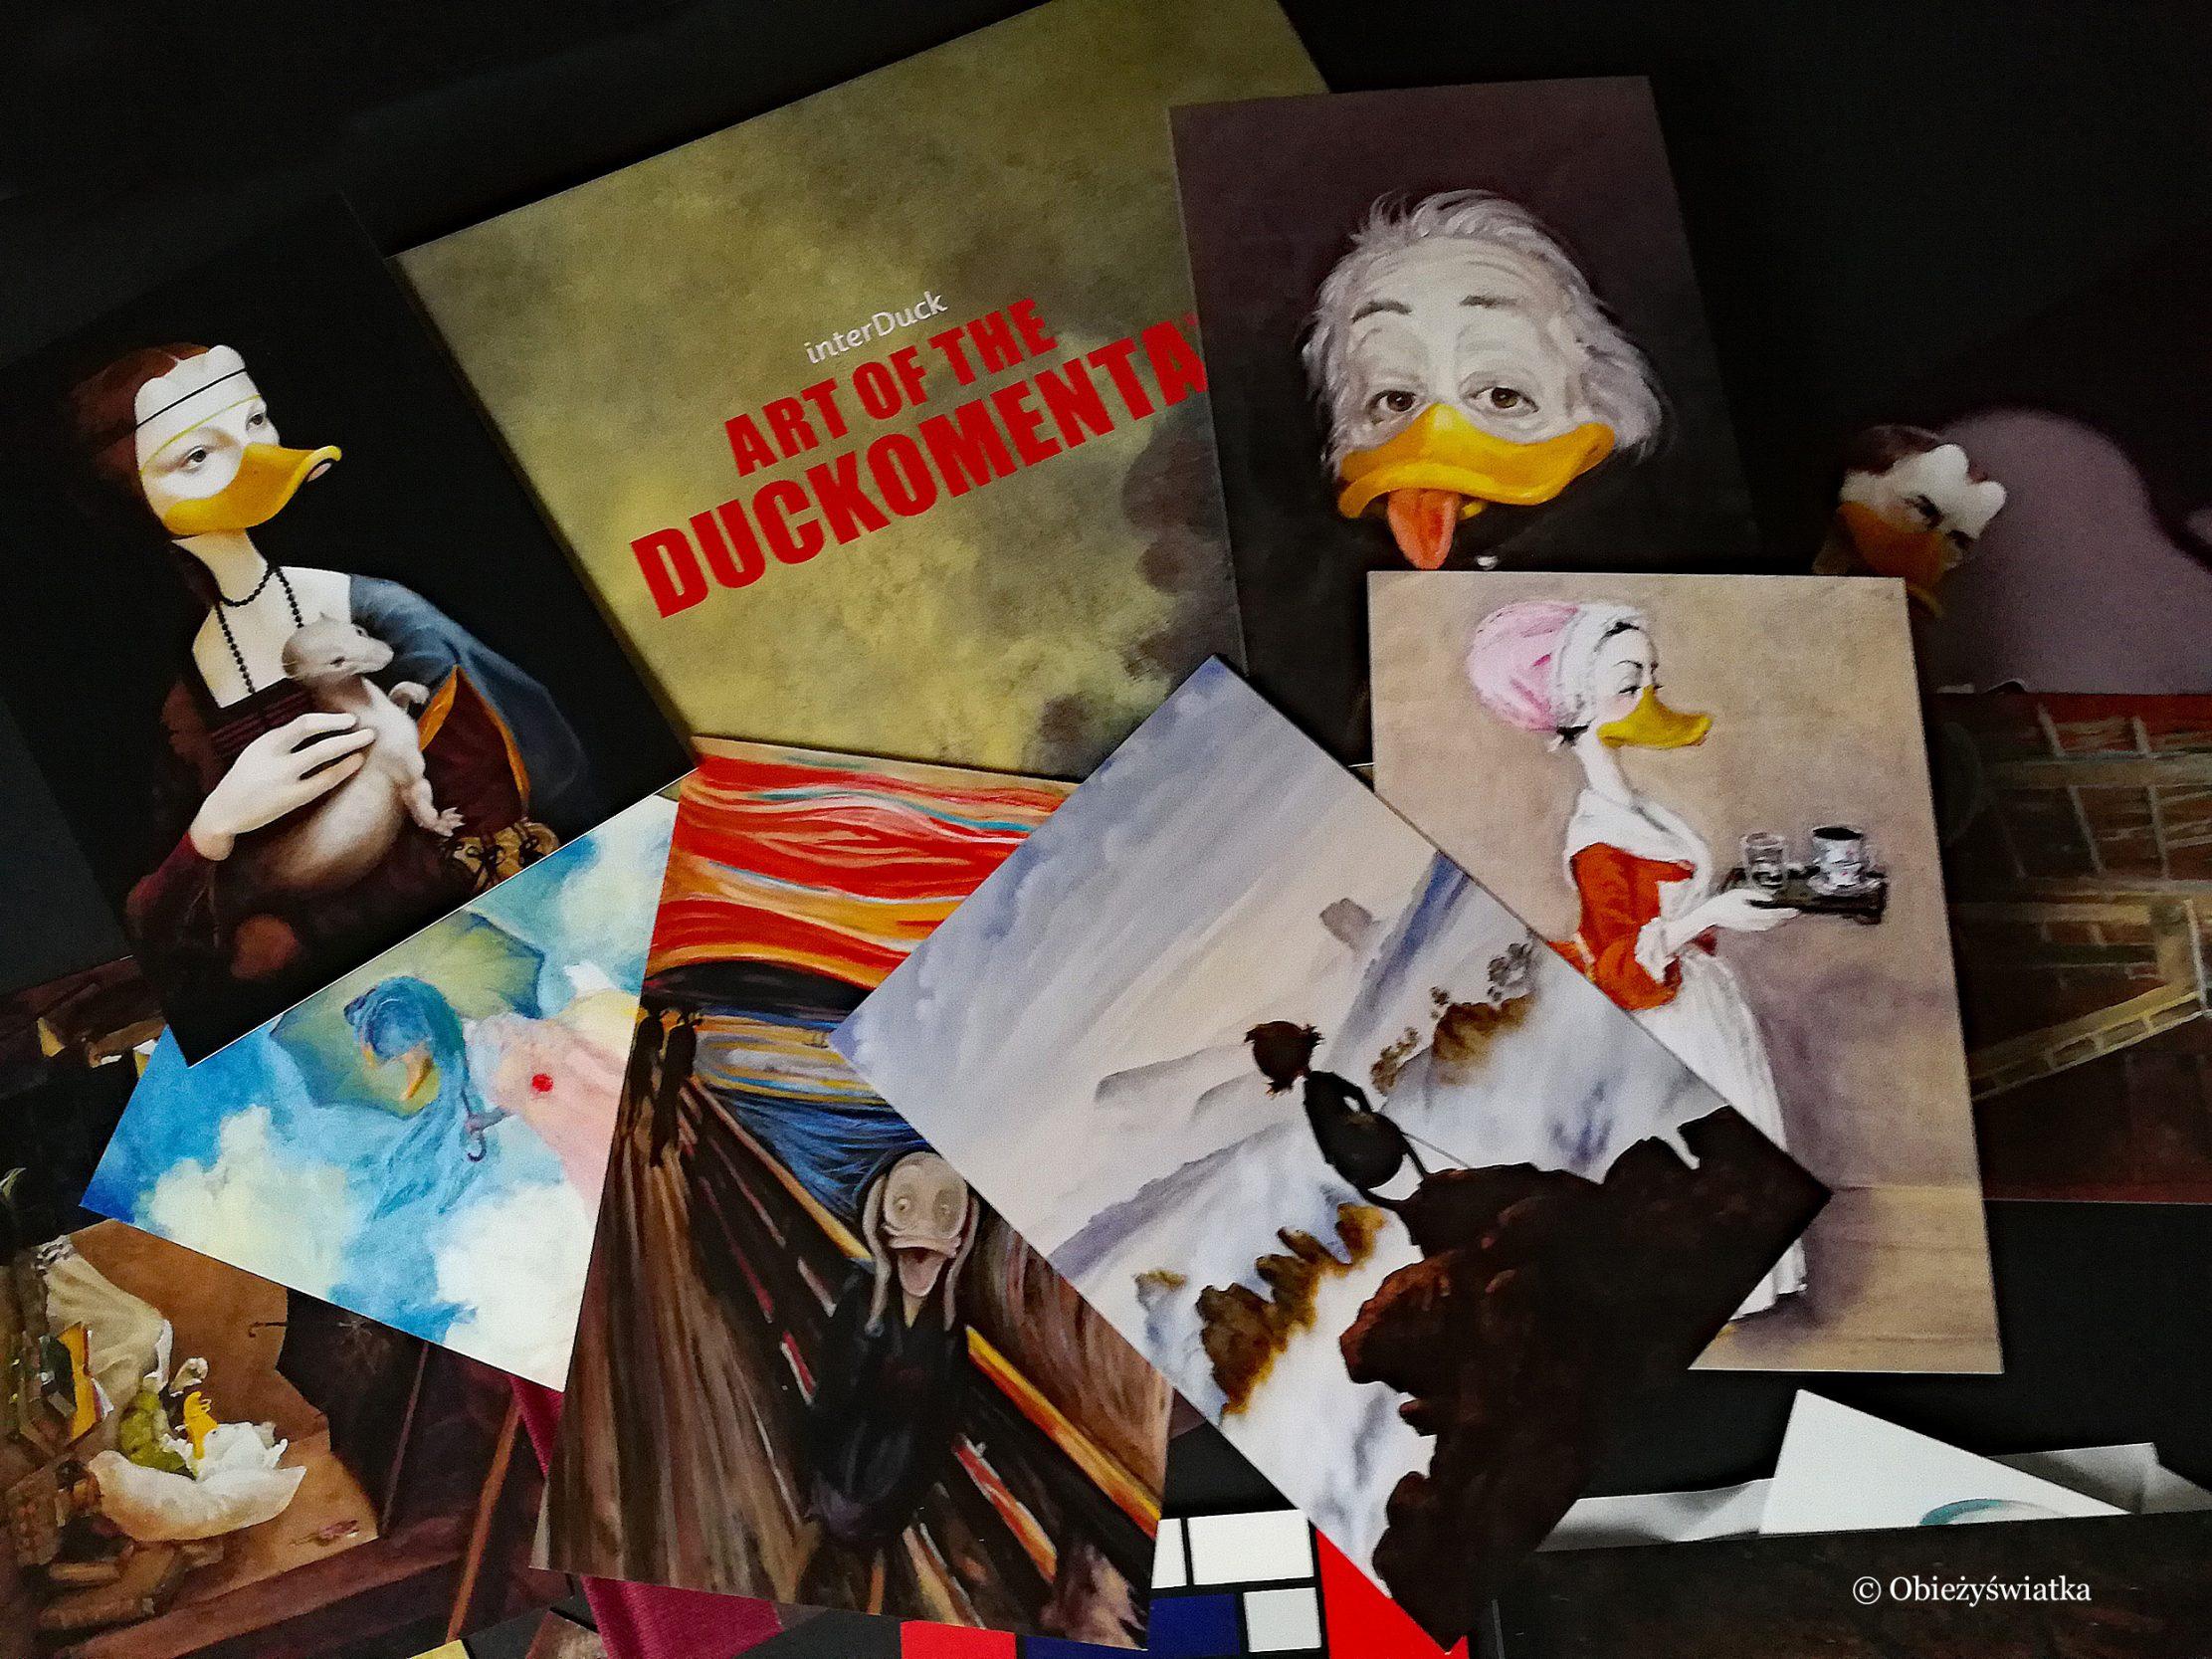 Duckomenta - katalog wystawy i pocztówki